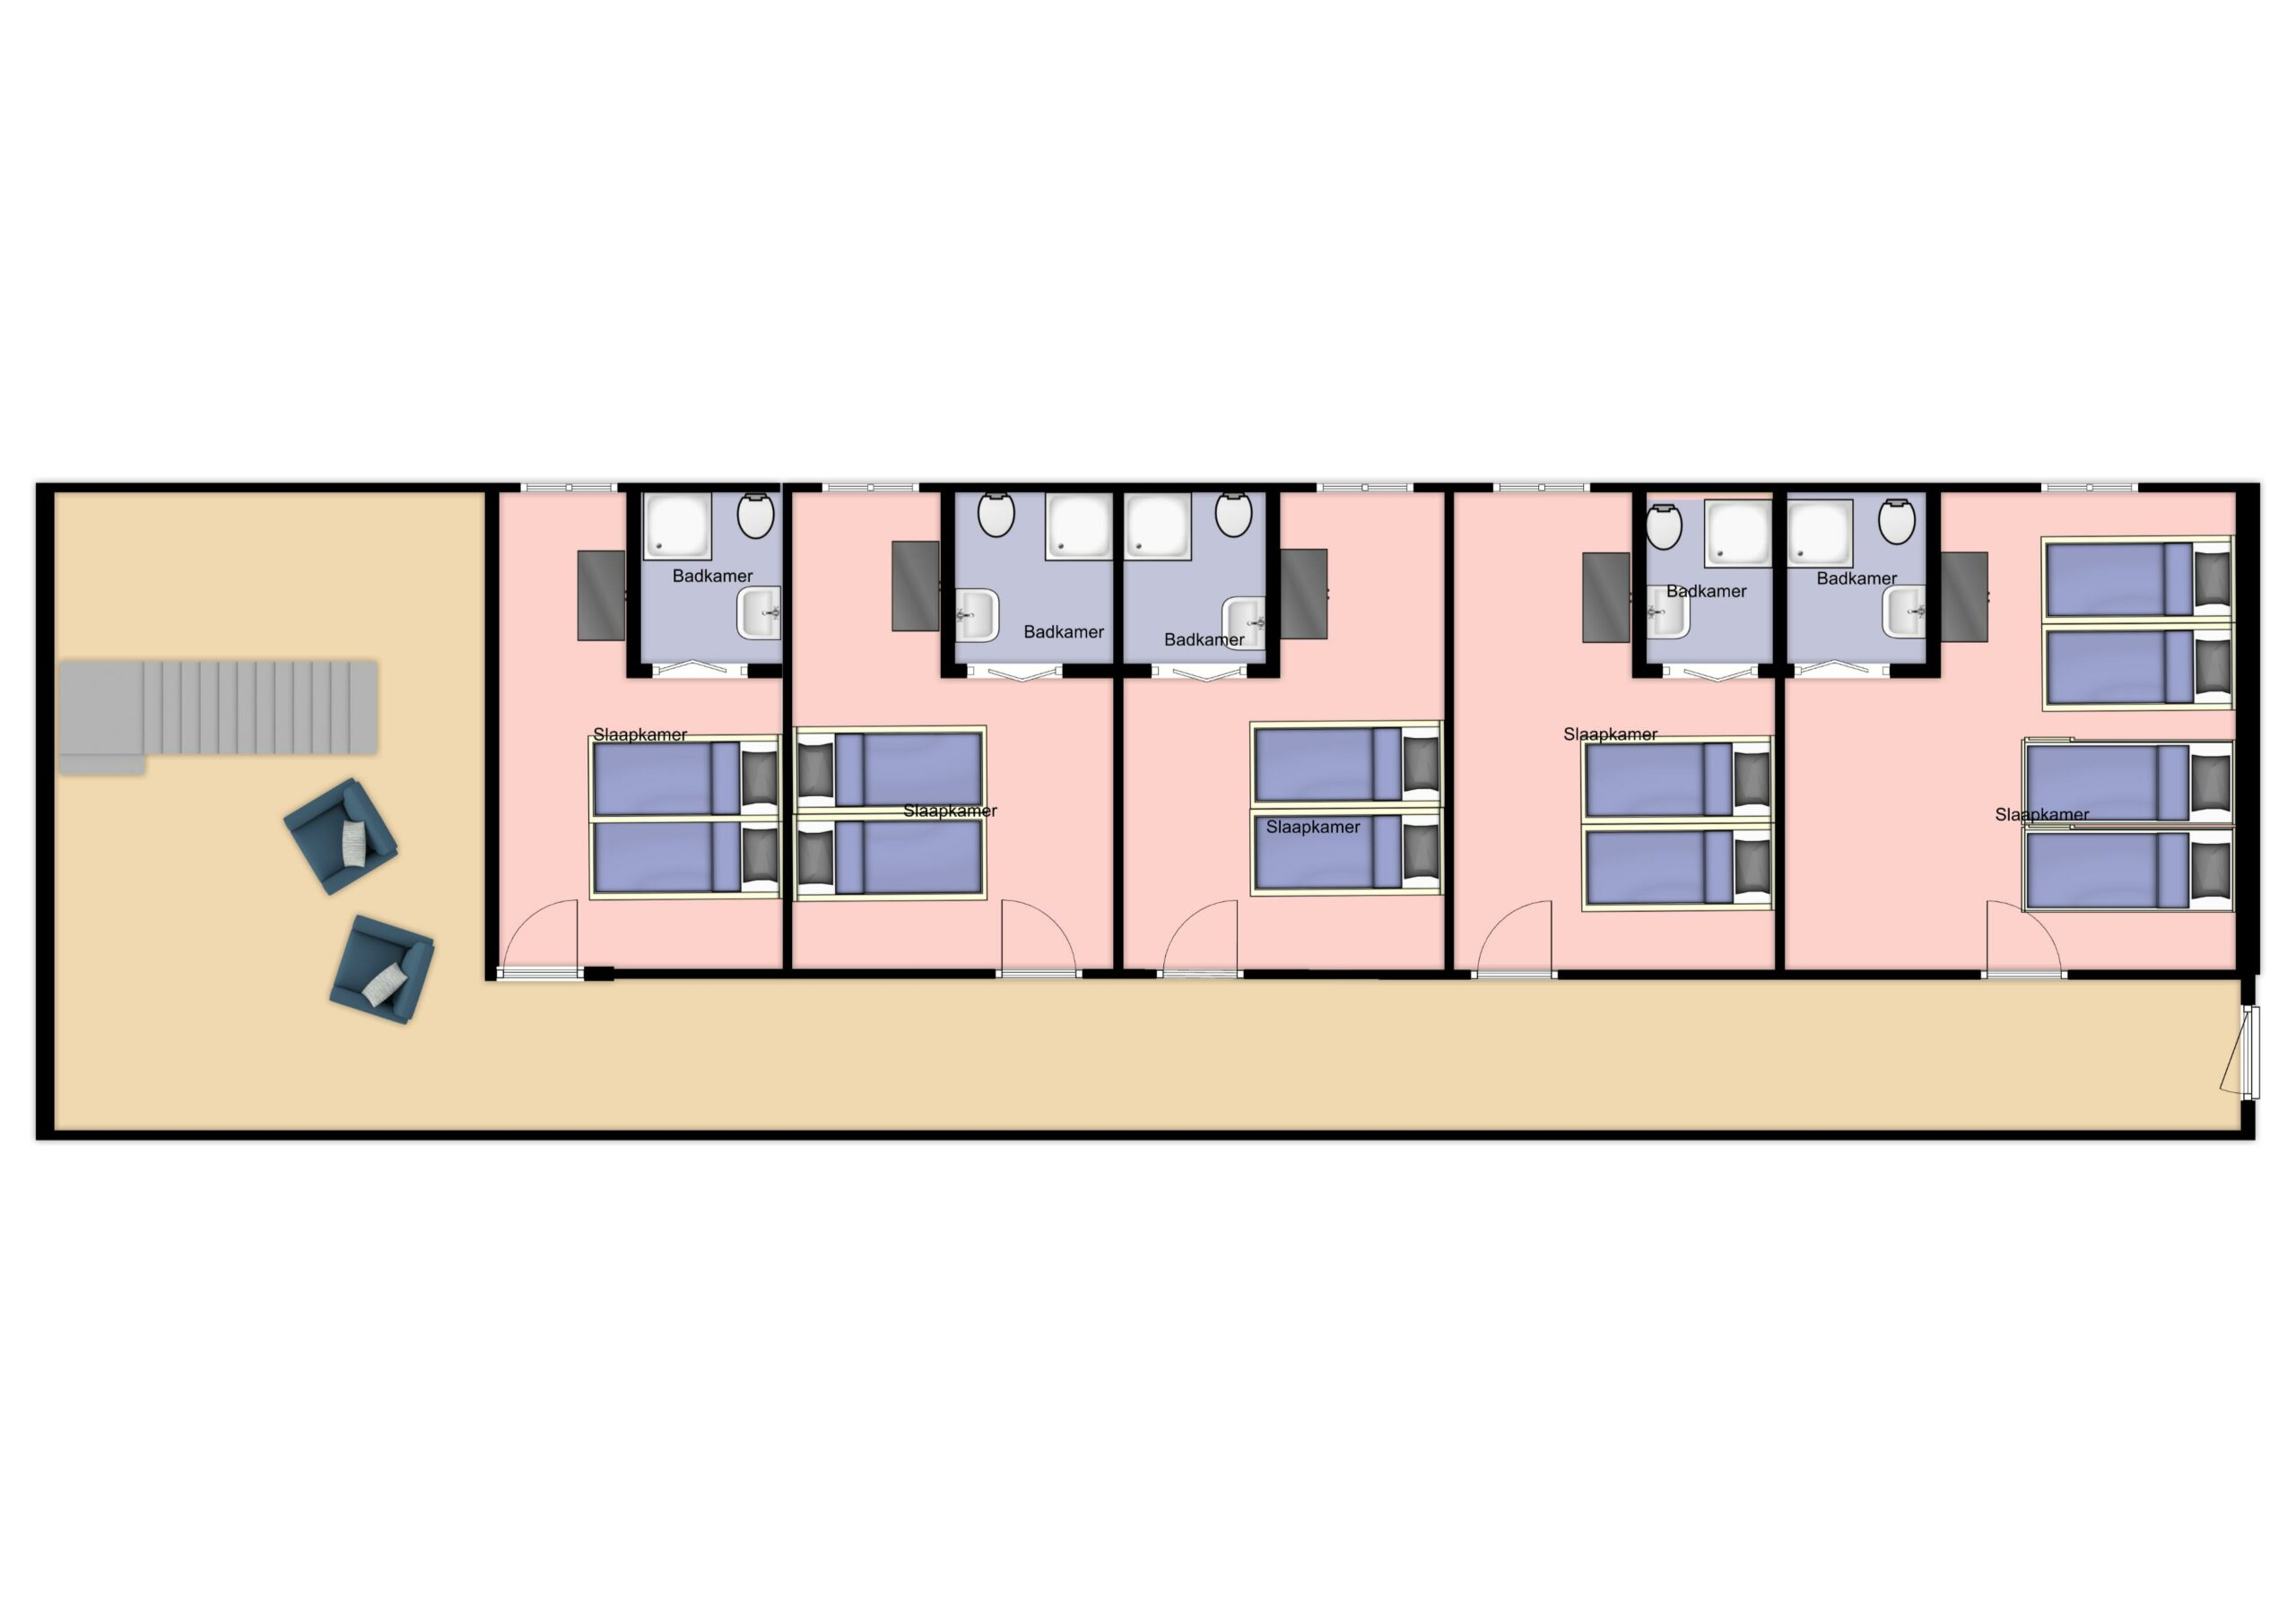 Plattegrond: eerste verdieping